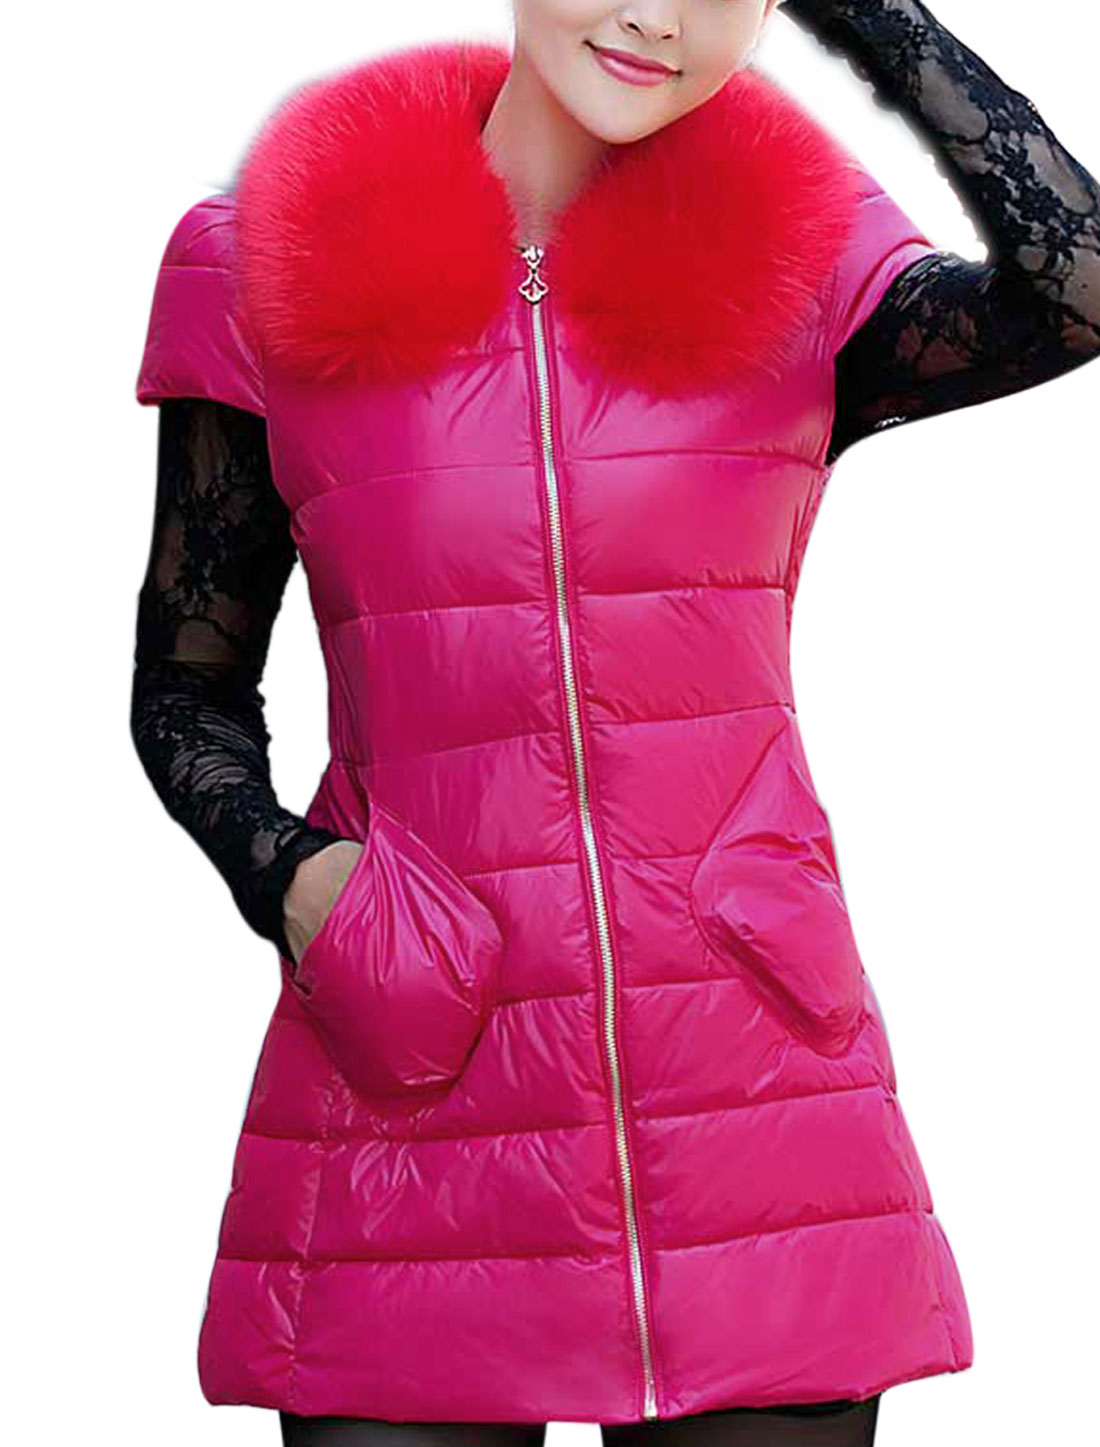 Ladies Round Neckline Full Zipper Cap Sleeves Padded Vest Fuchsia XS